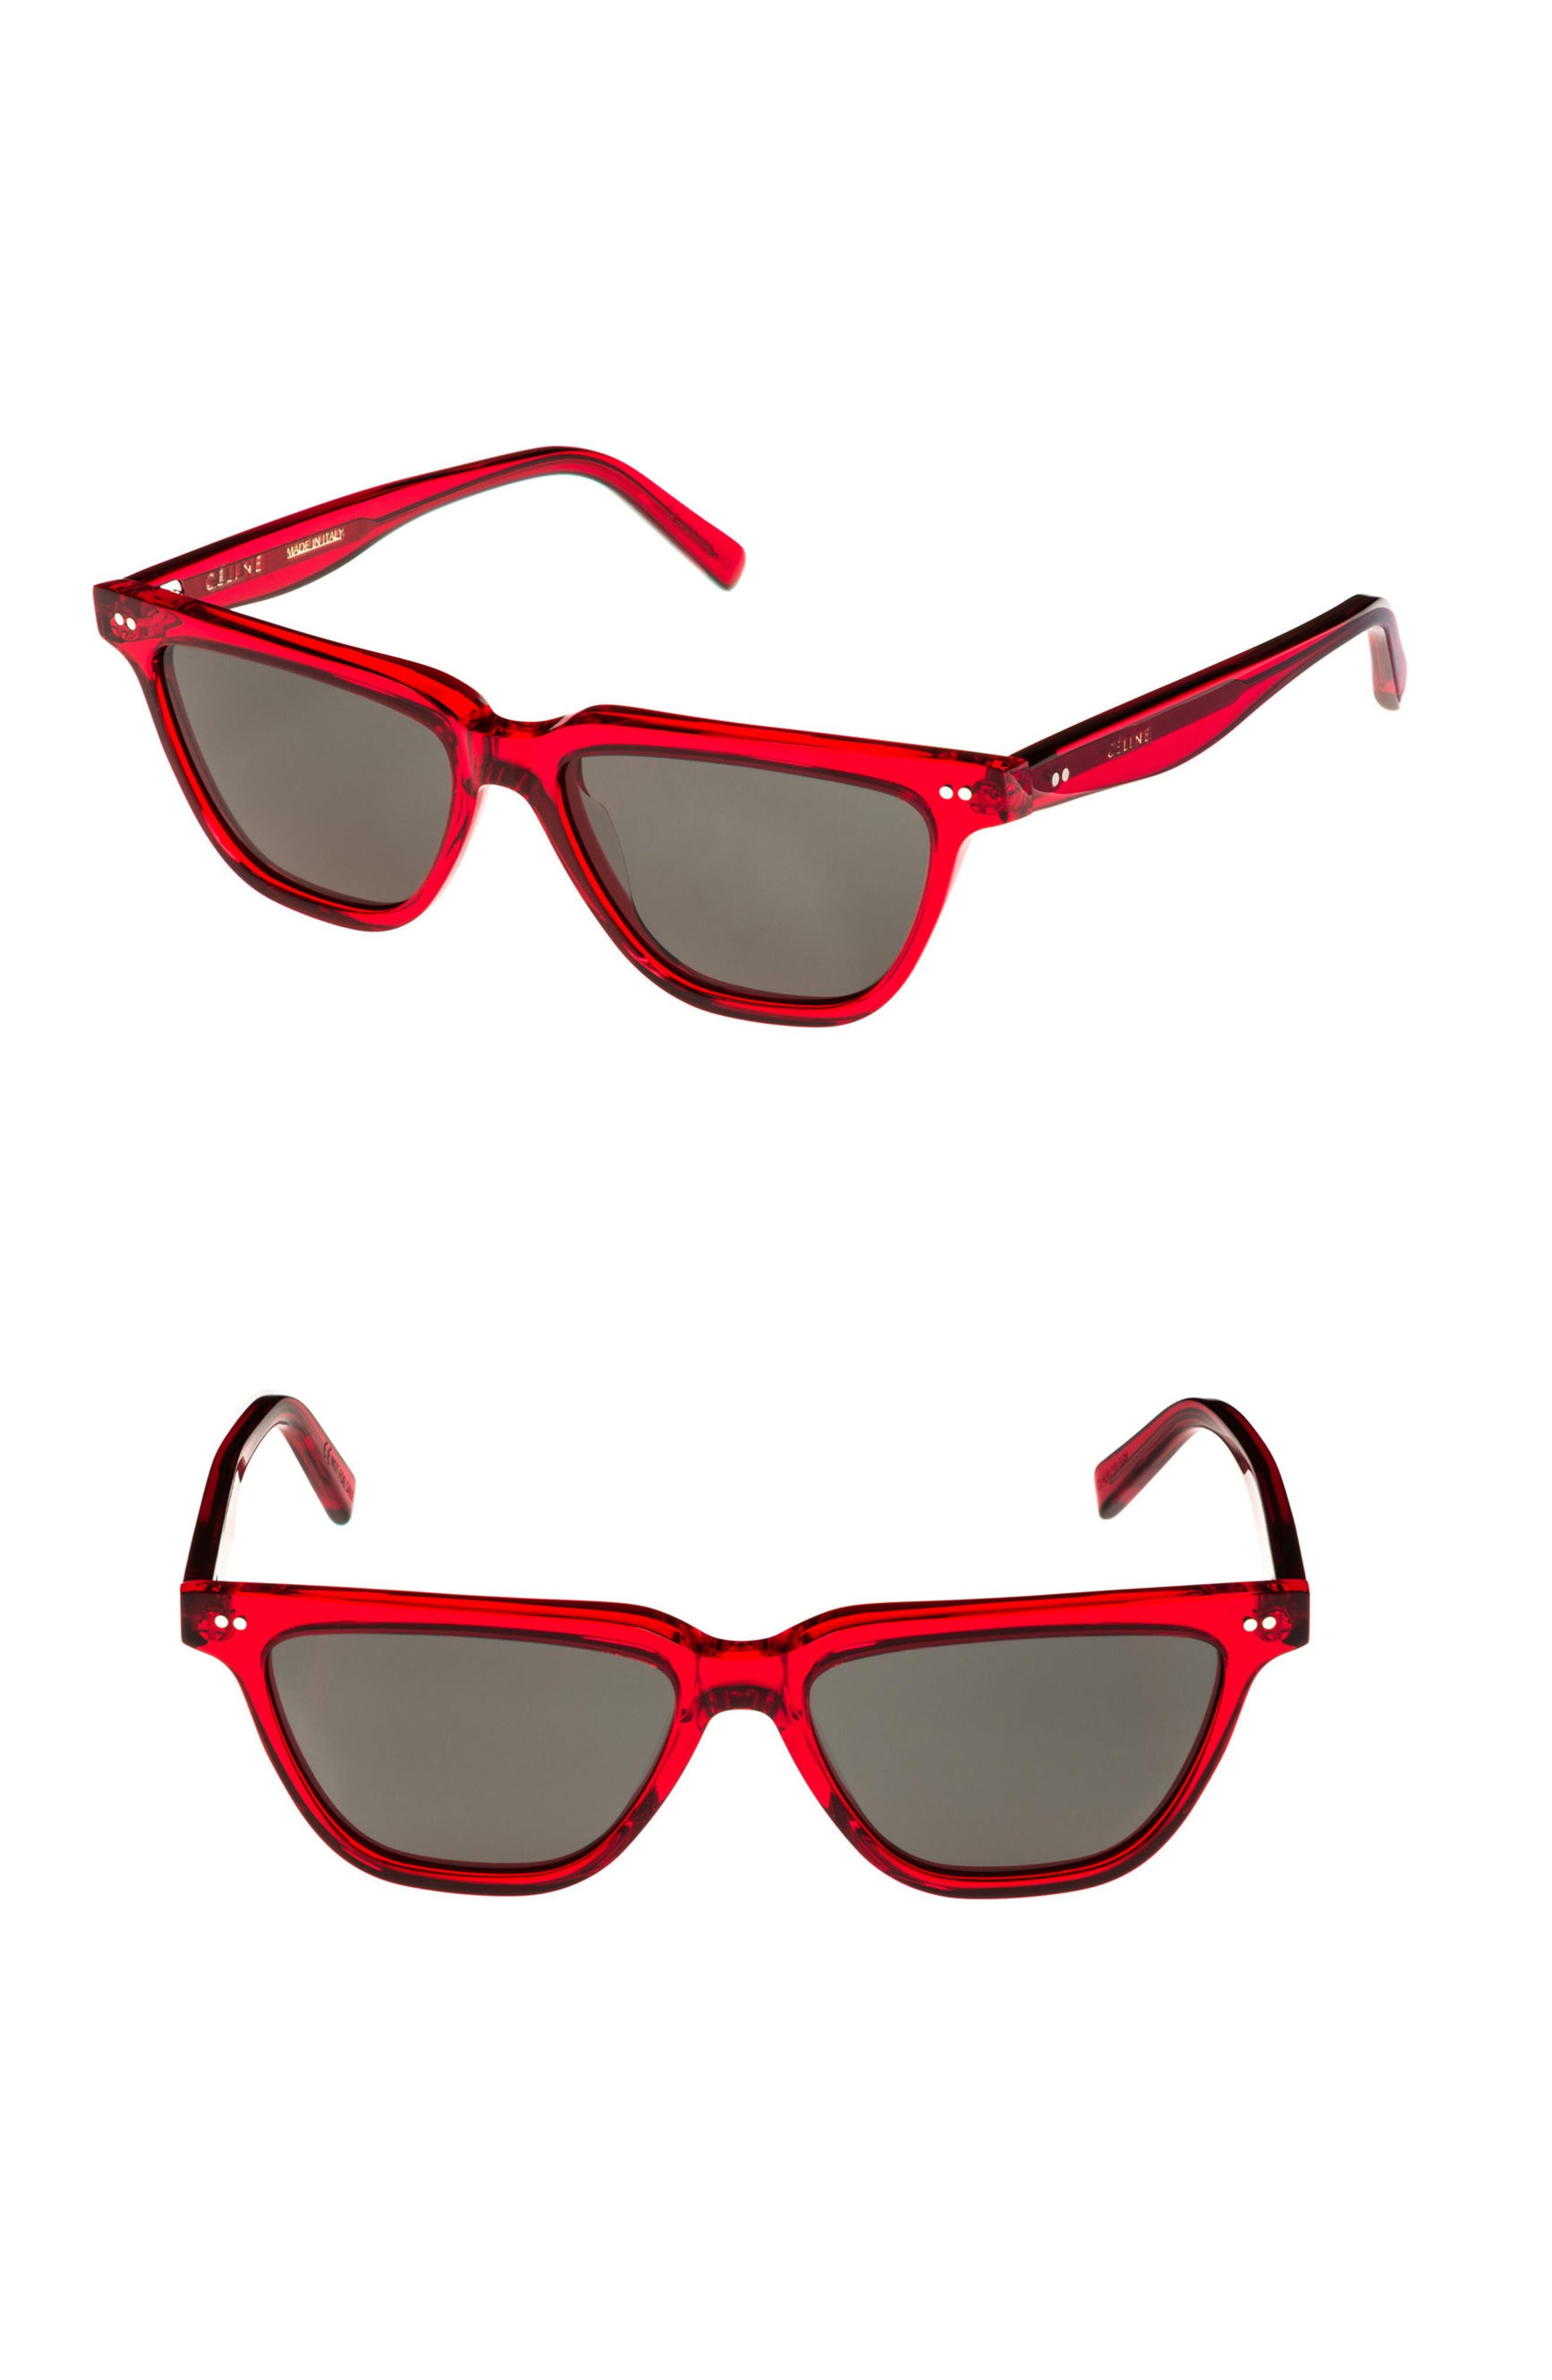 eef8732f24058 CELINE Sunglasses for Women